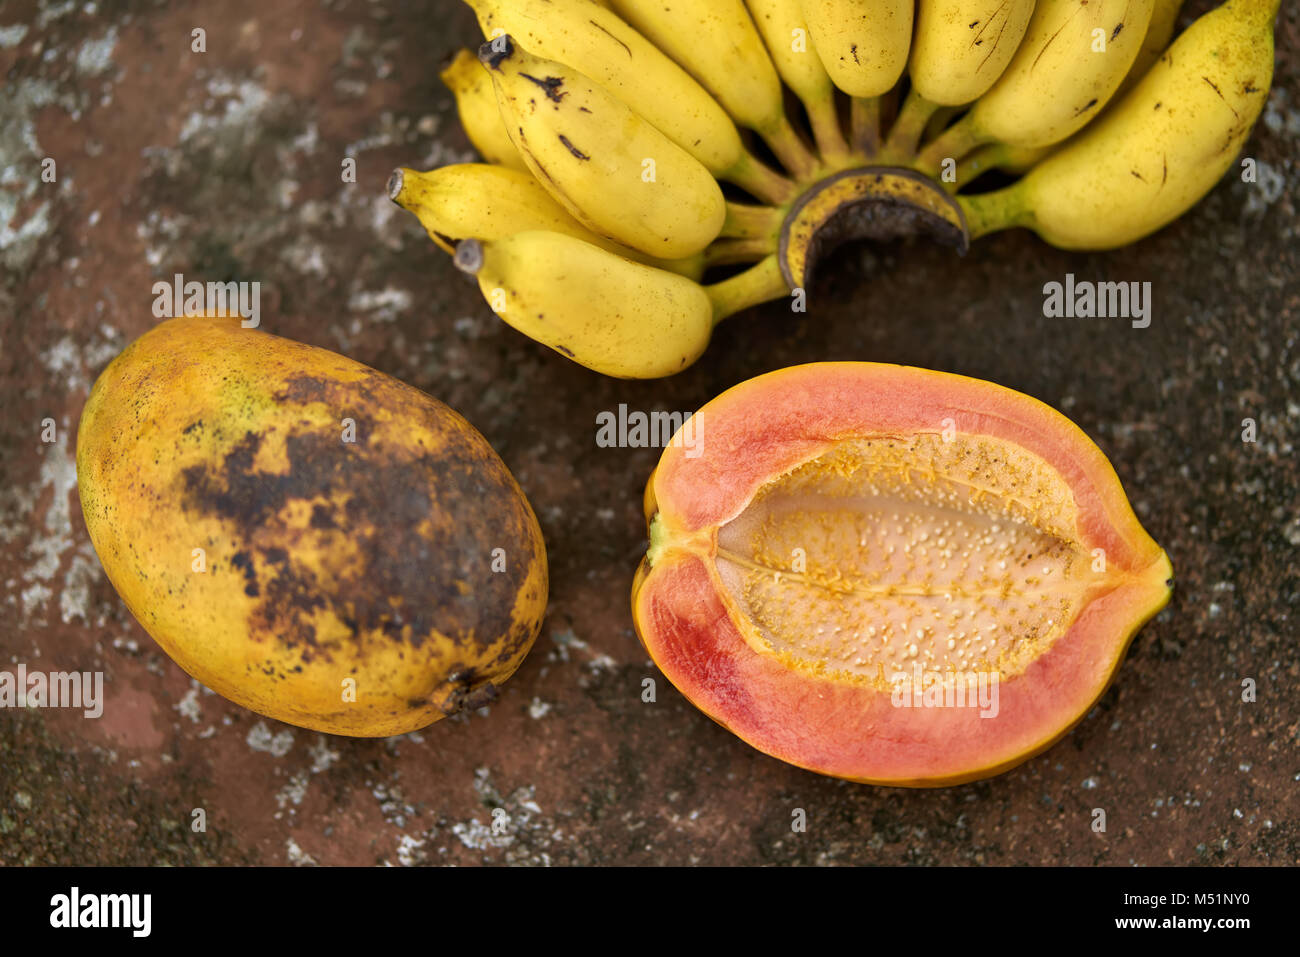 Bunte Papaya und Bananen Stockbild